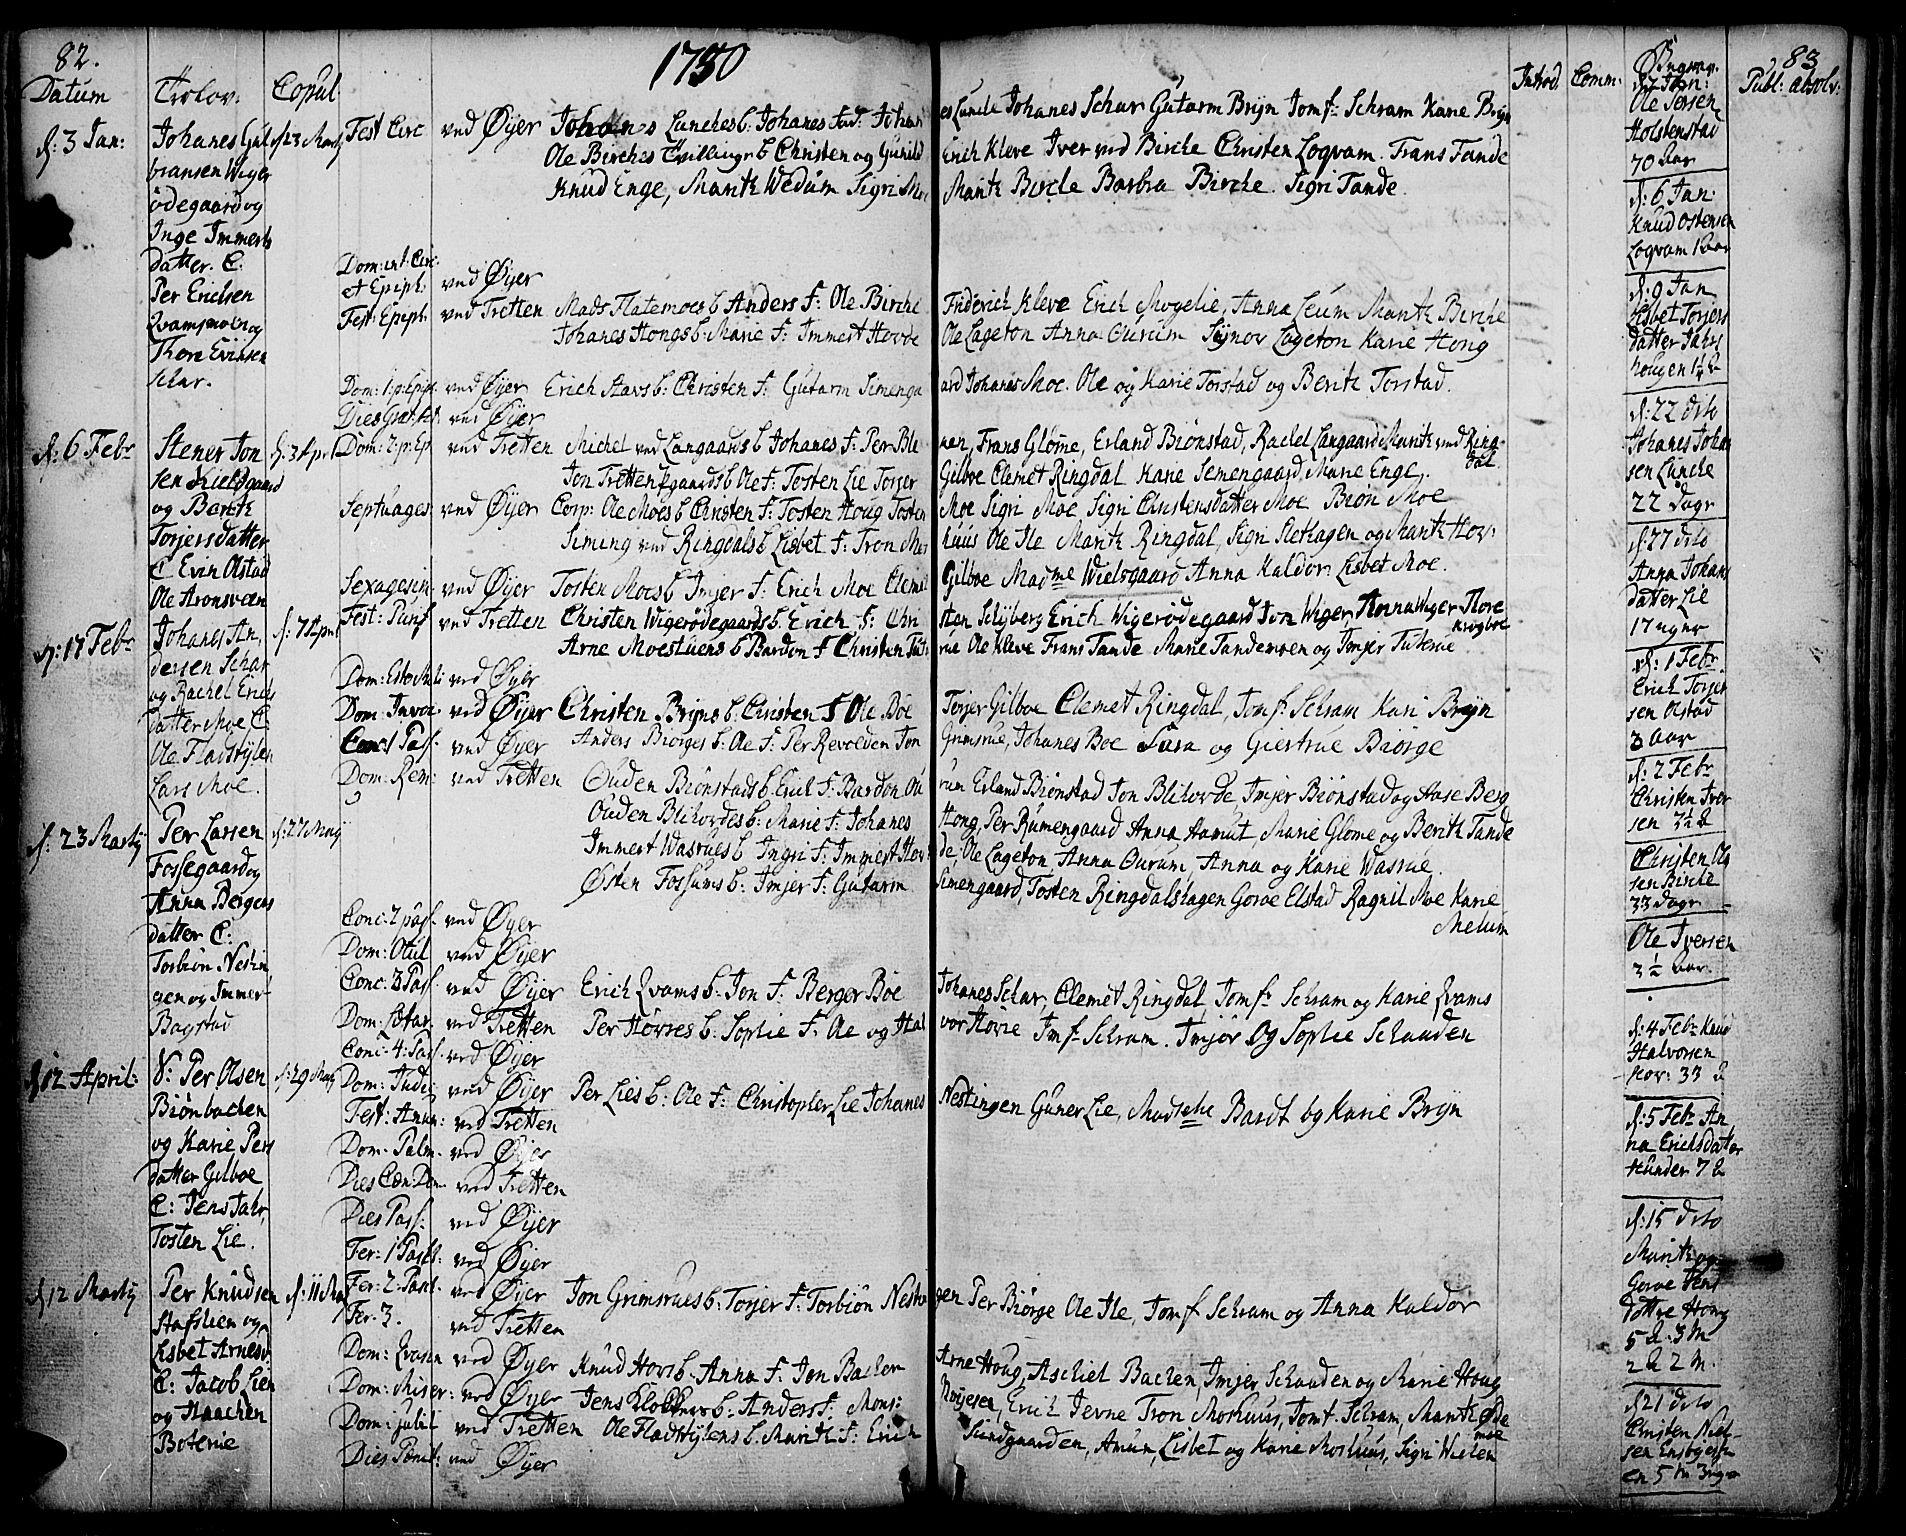 SAH, Øyer prestekontor, Ministerialbok nr. 2, 1733-1784, s. 80-81